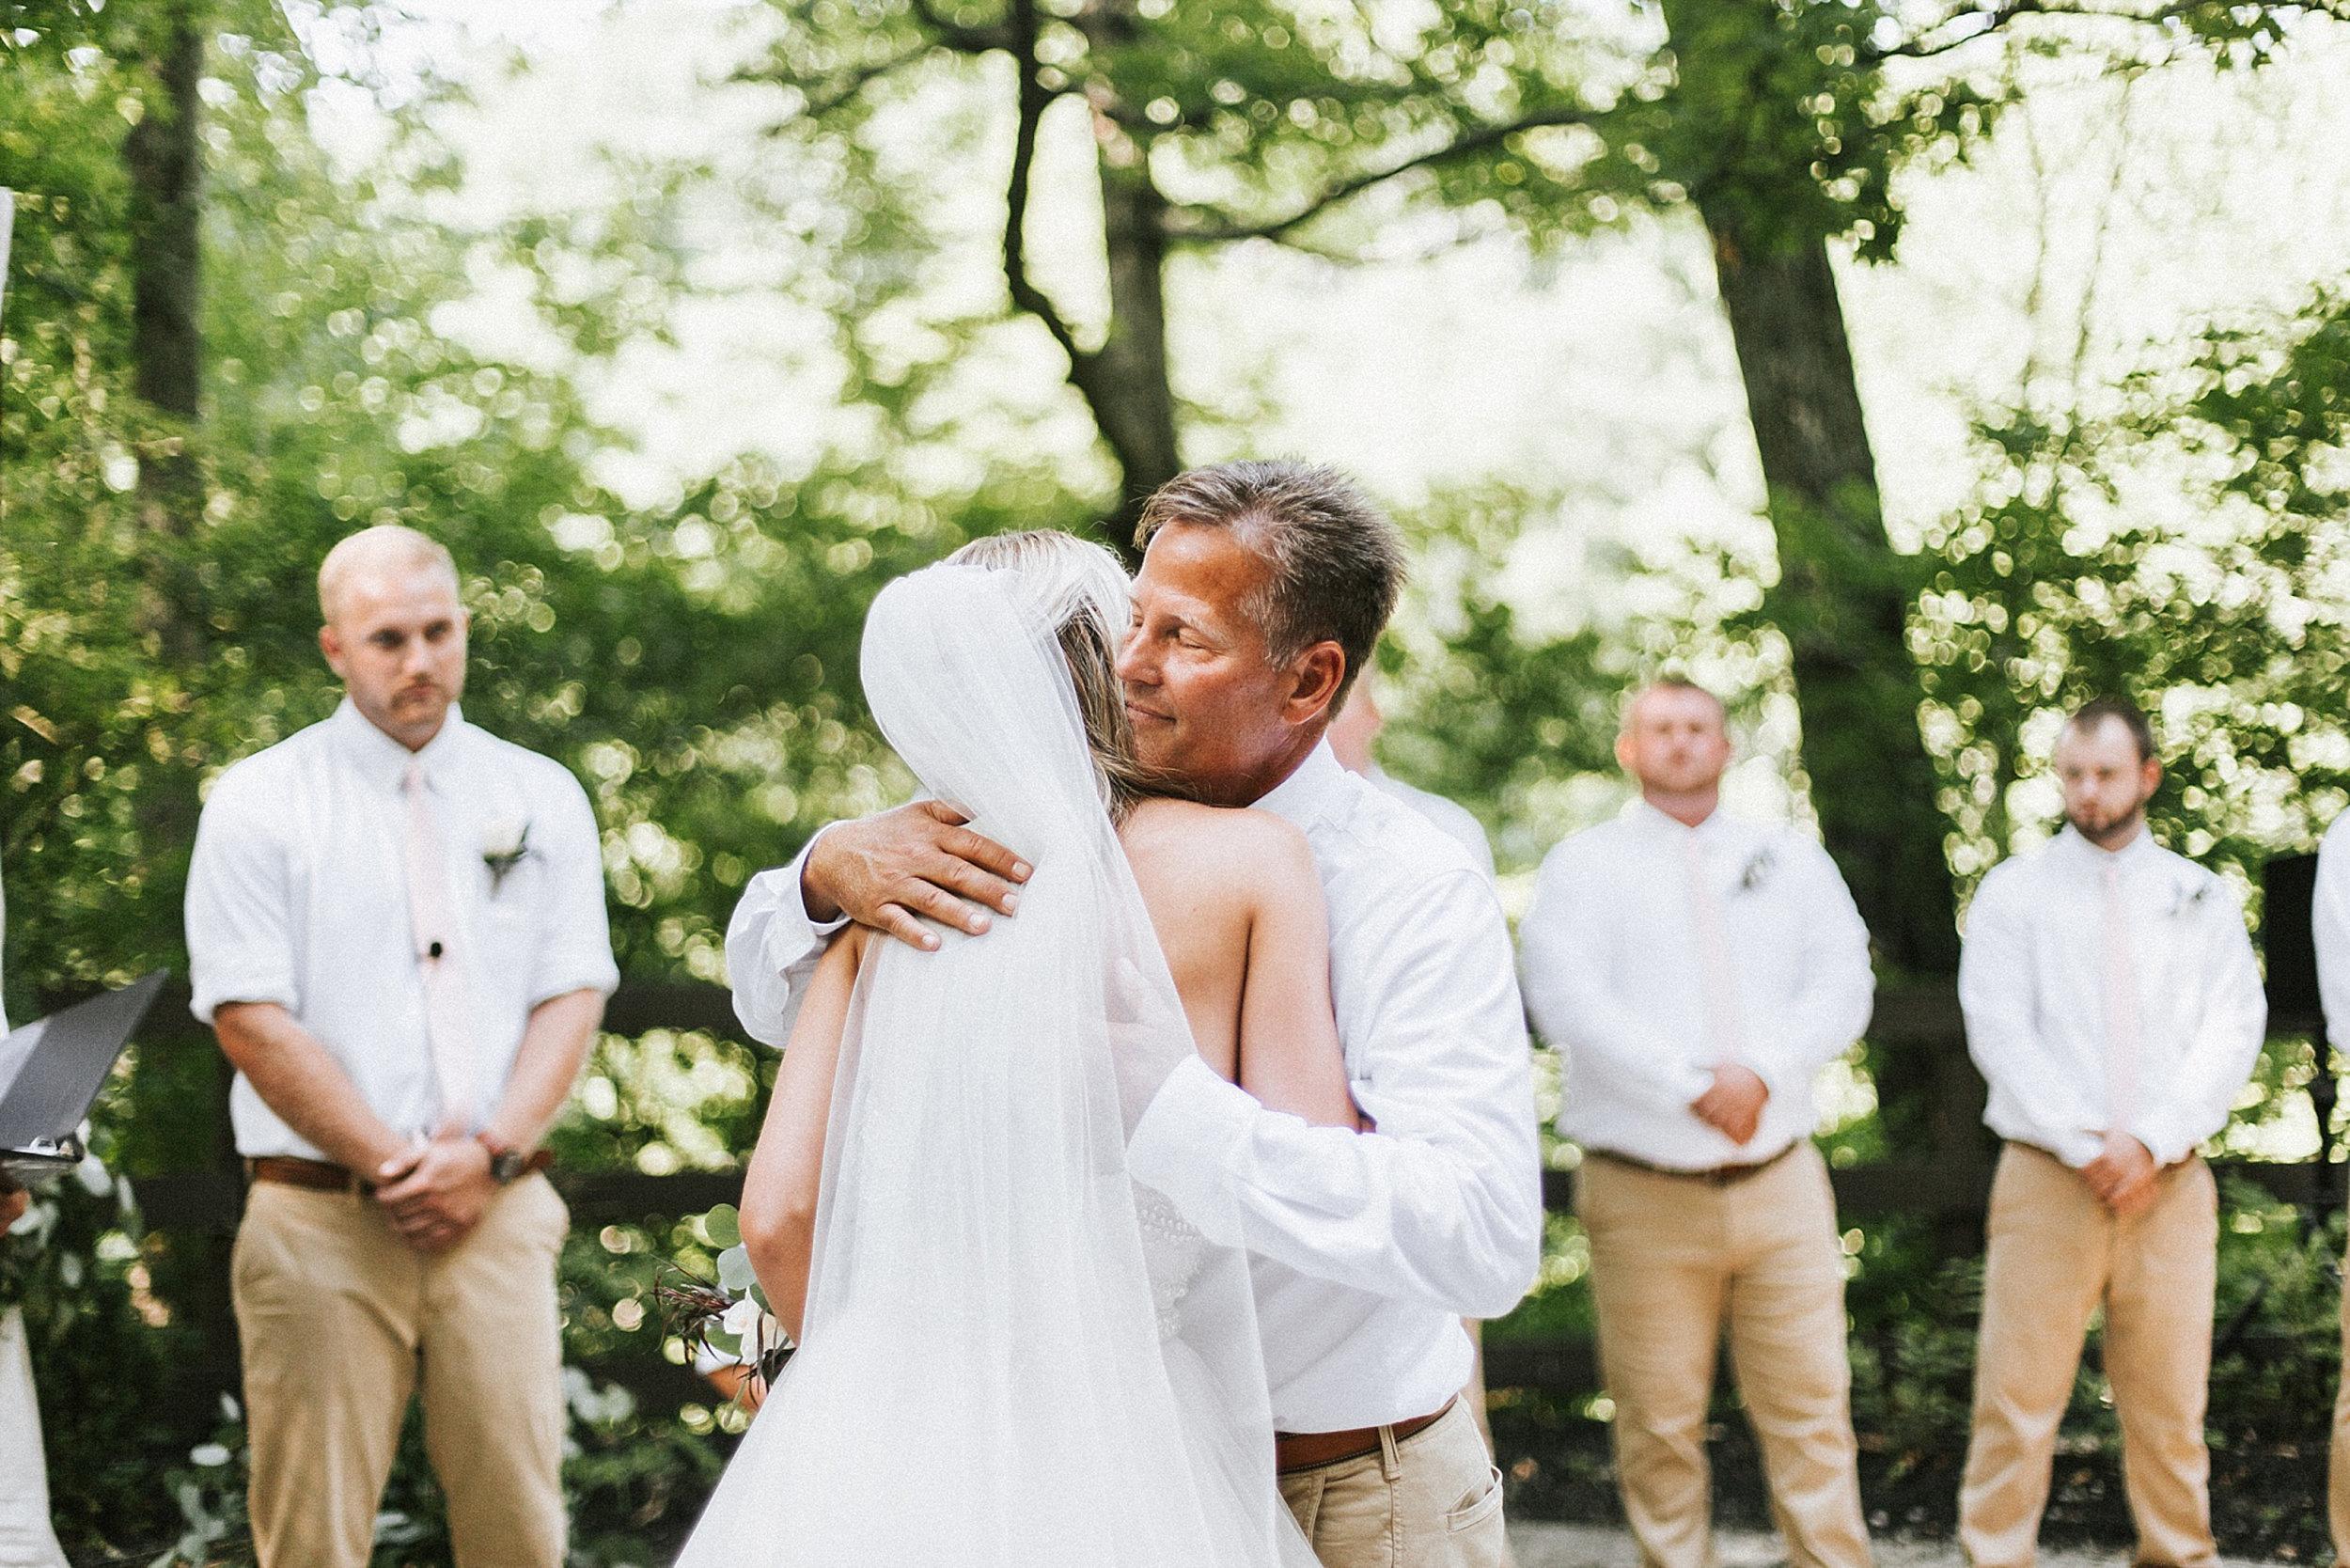 Brooke Townsend Photography - Cincinnati Wedding Photographer (71 of 153).jpg